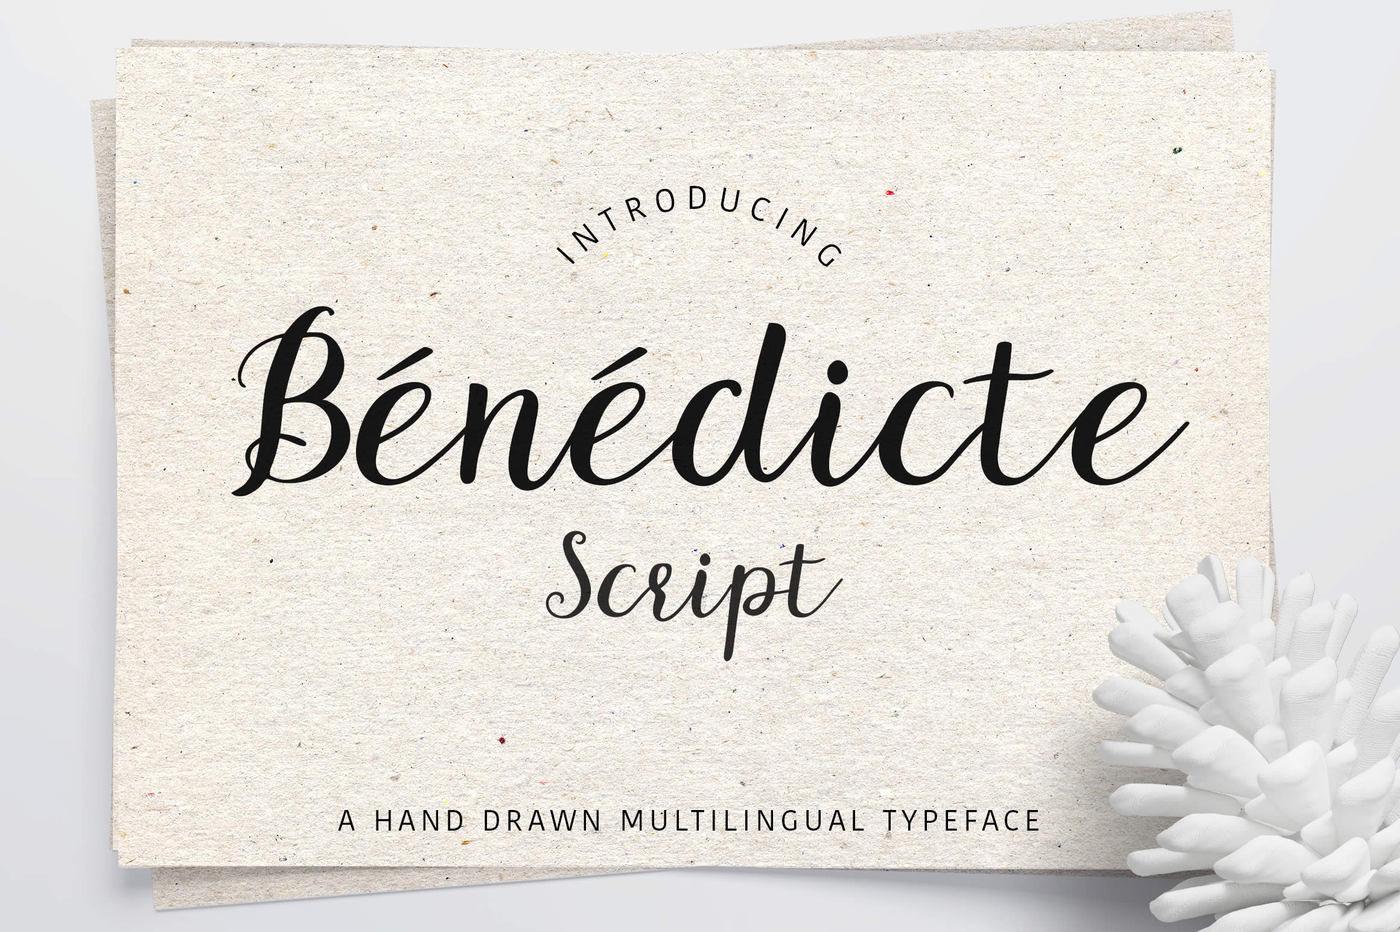 Benedicte Scipt By Ayca Atalay Creative Thehungryjpeg Com